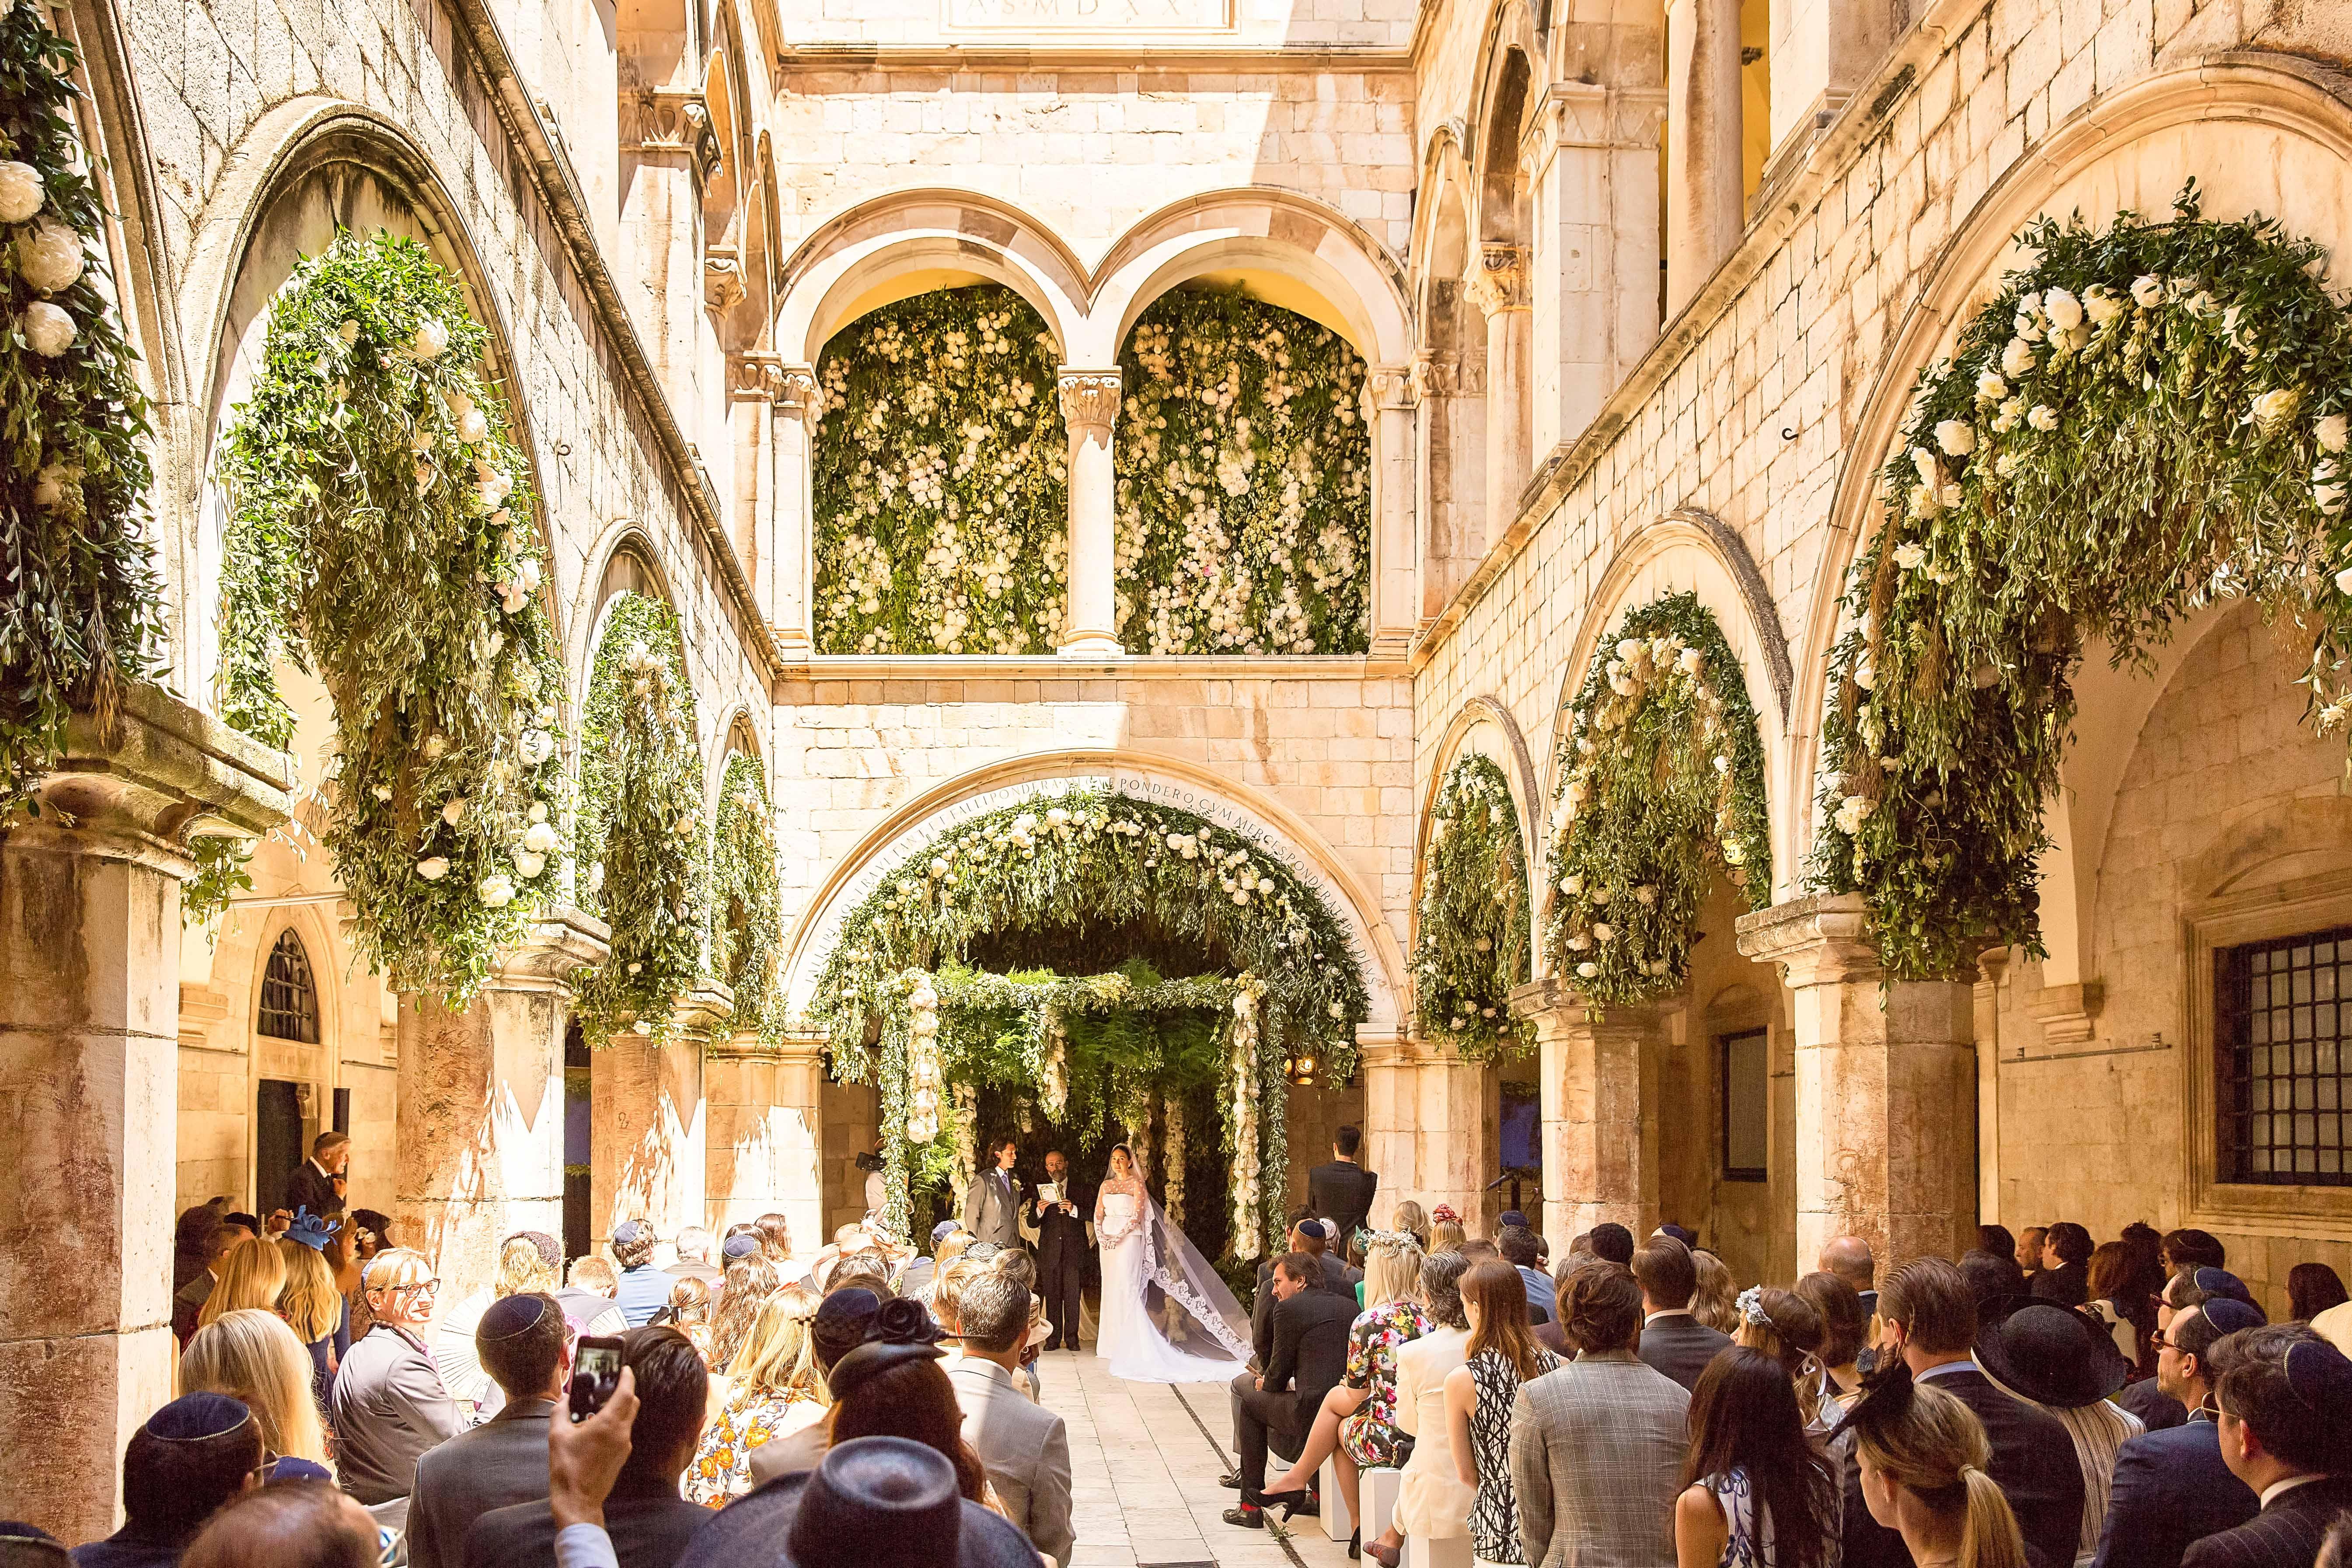 Marcy Blum Wedding in Dubrovnik, Croatia